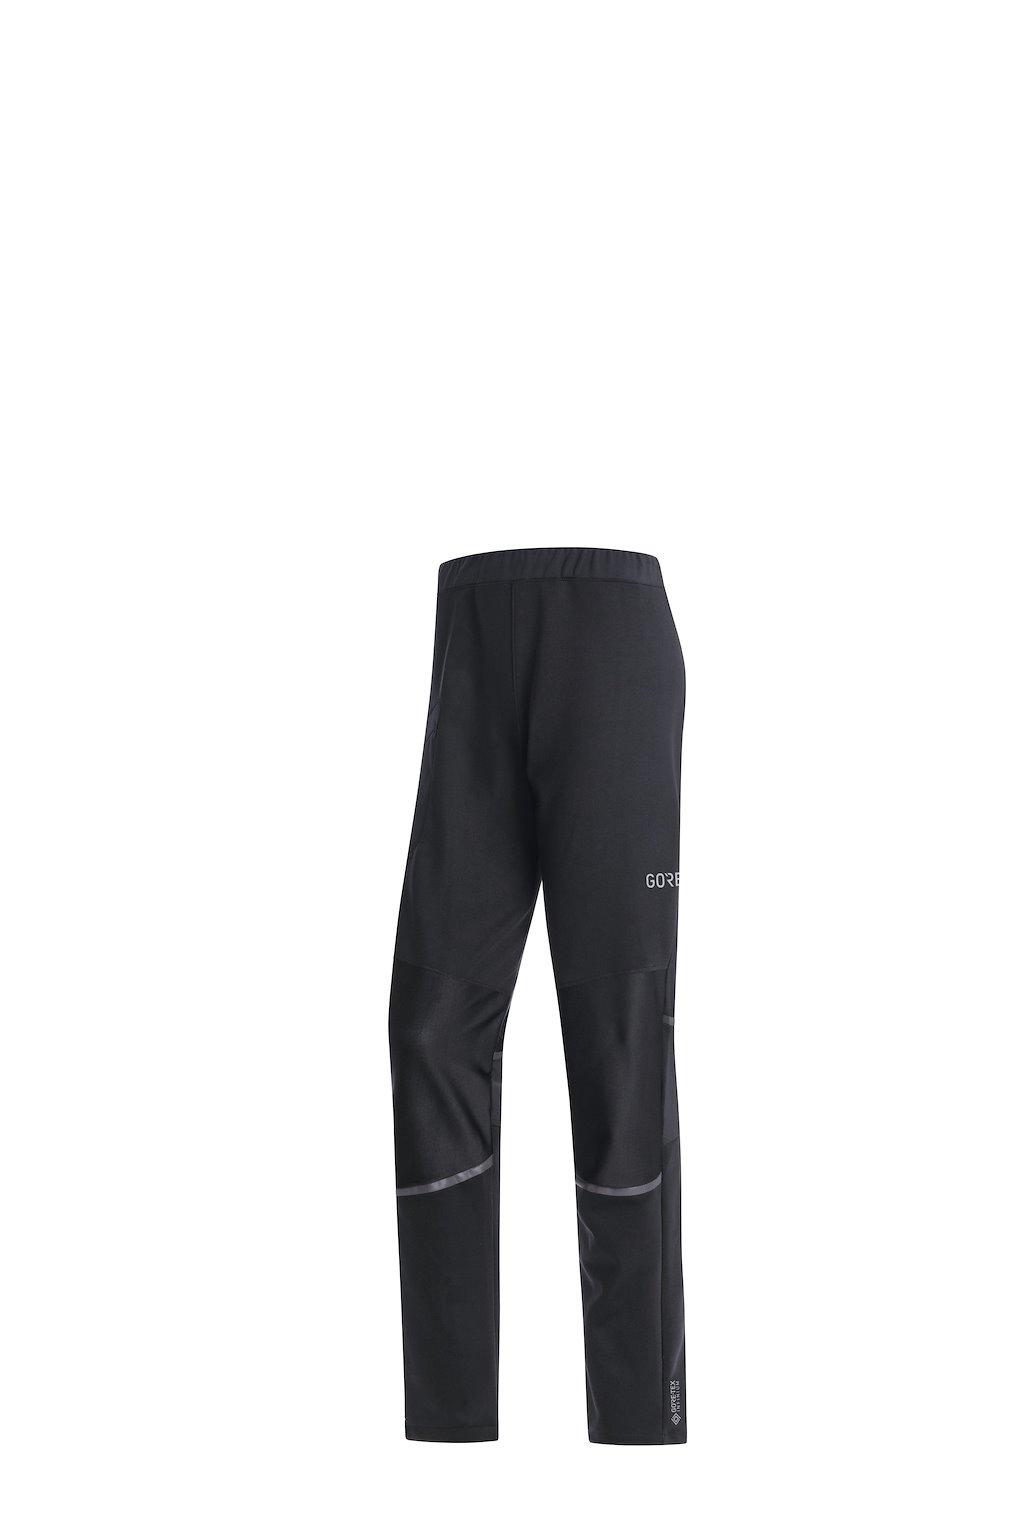 GORE® R5 Wmn GTX I Pants